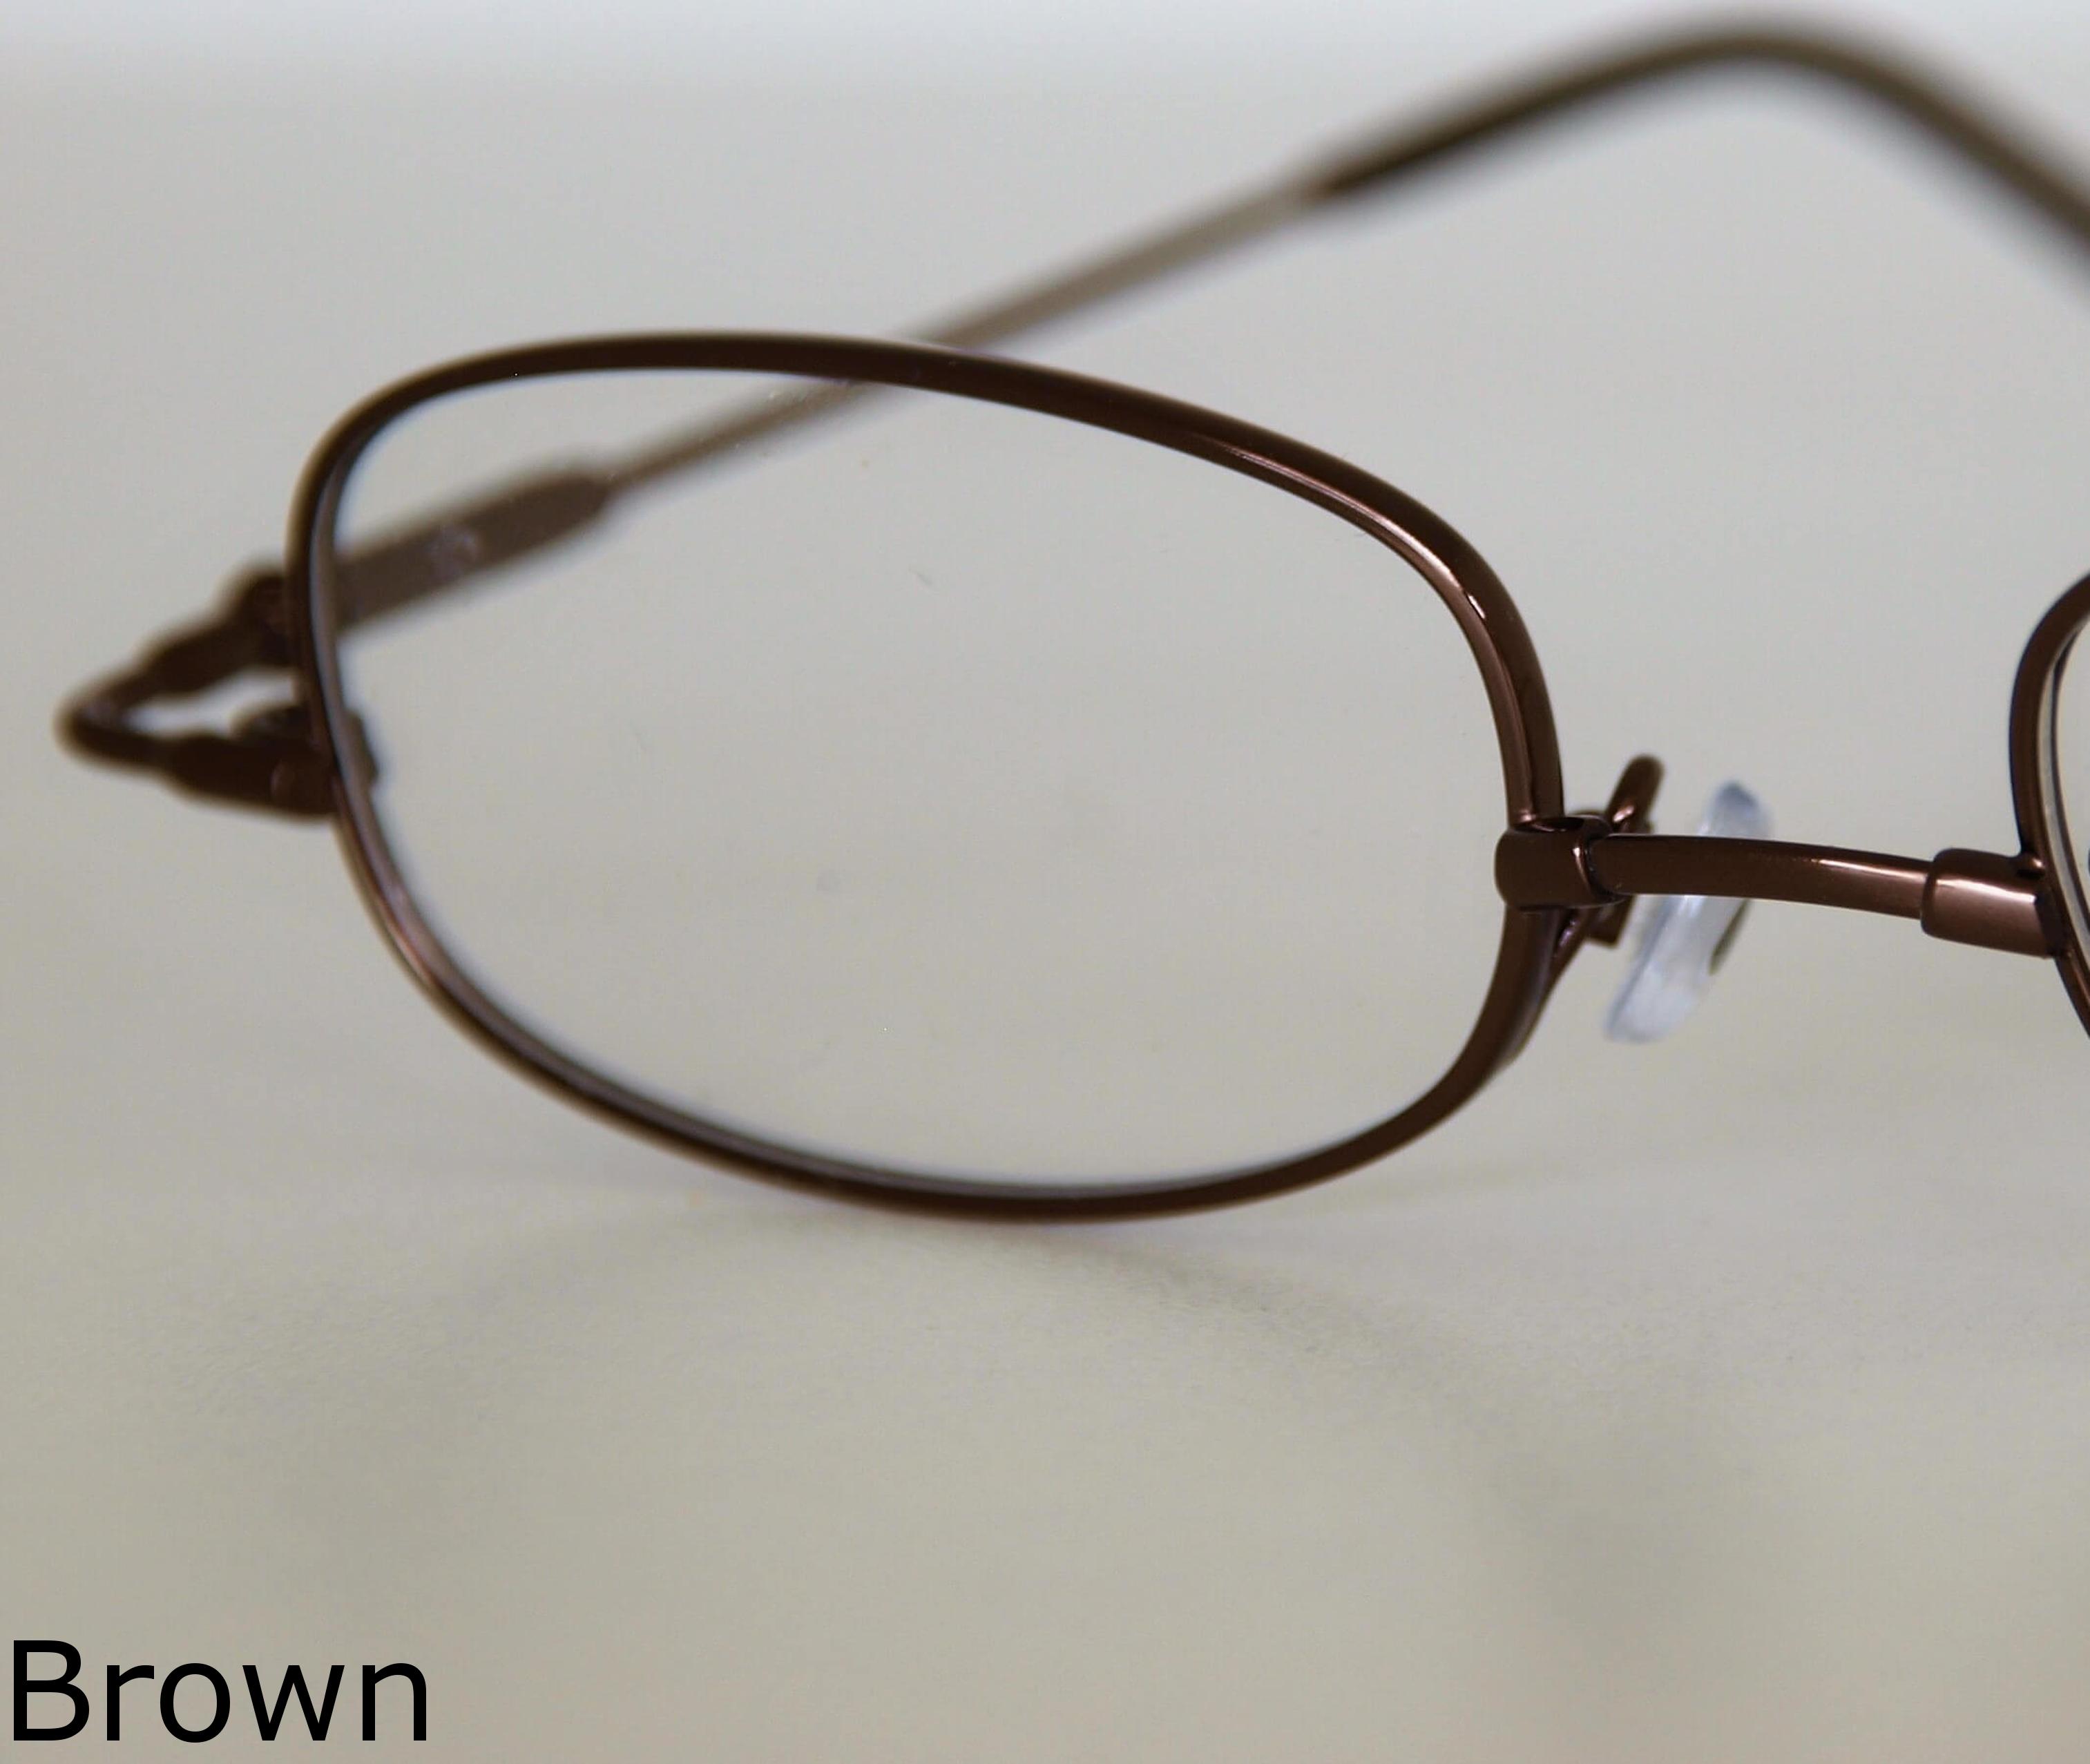 - Brown